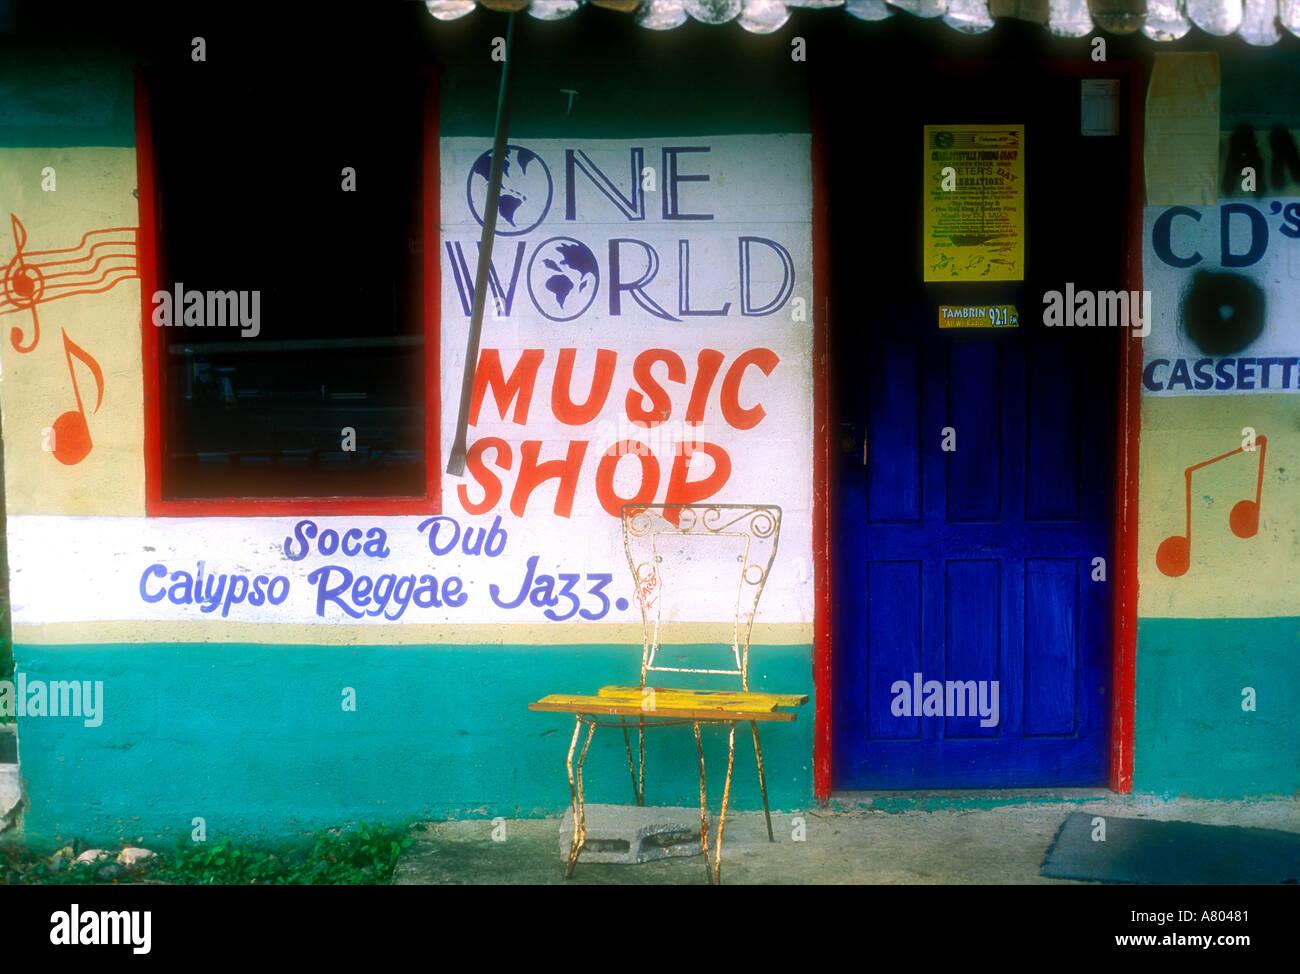 Facade of Reggae Music store at Store Bay Tobago West Indies Caribbean - Stock Image